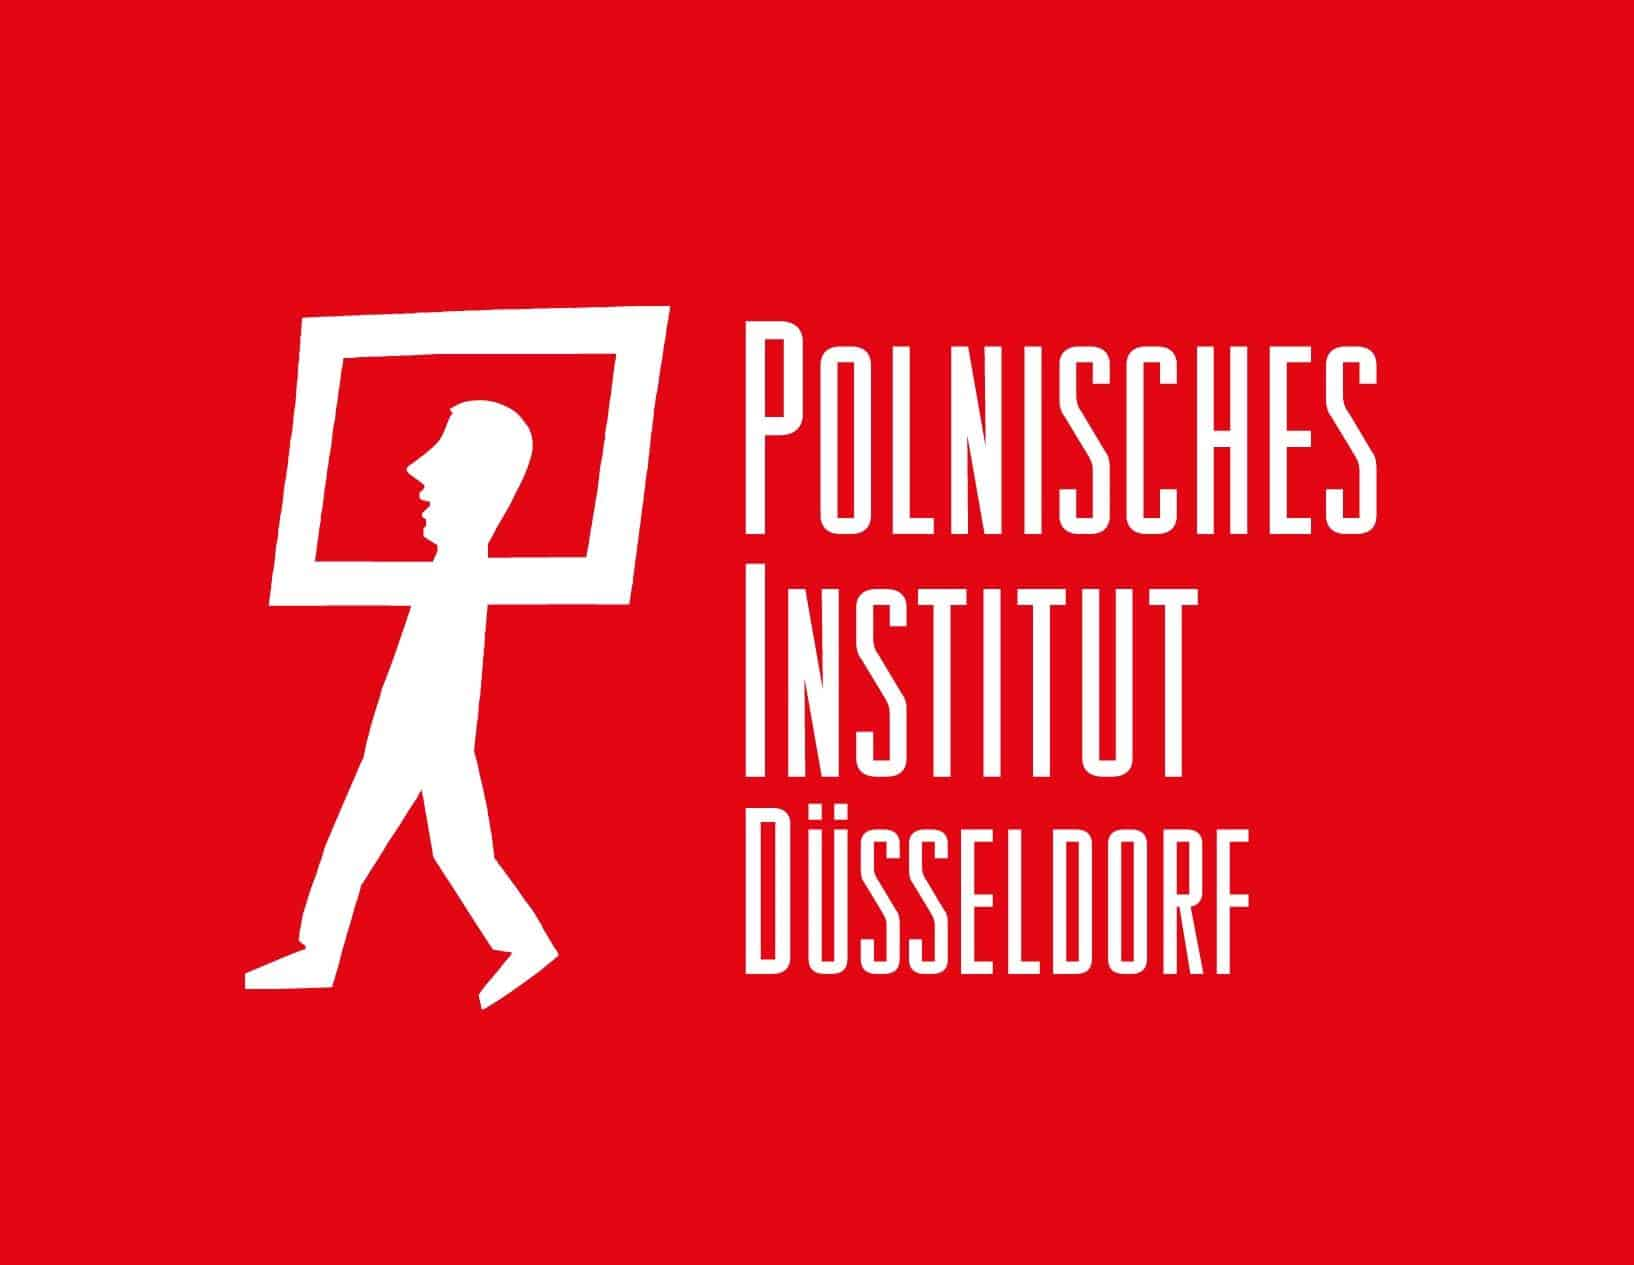 polski instytut dusseldorf